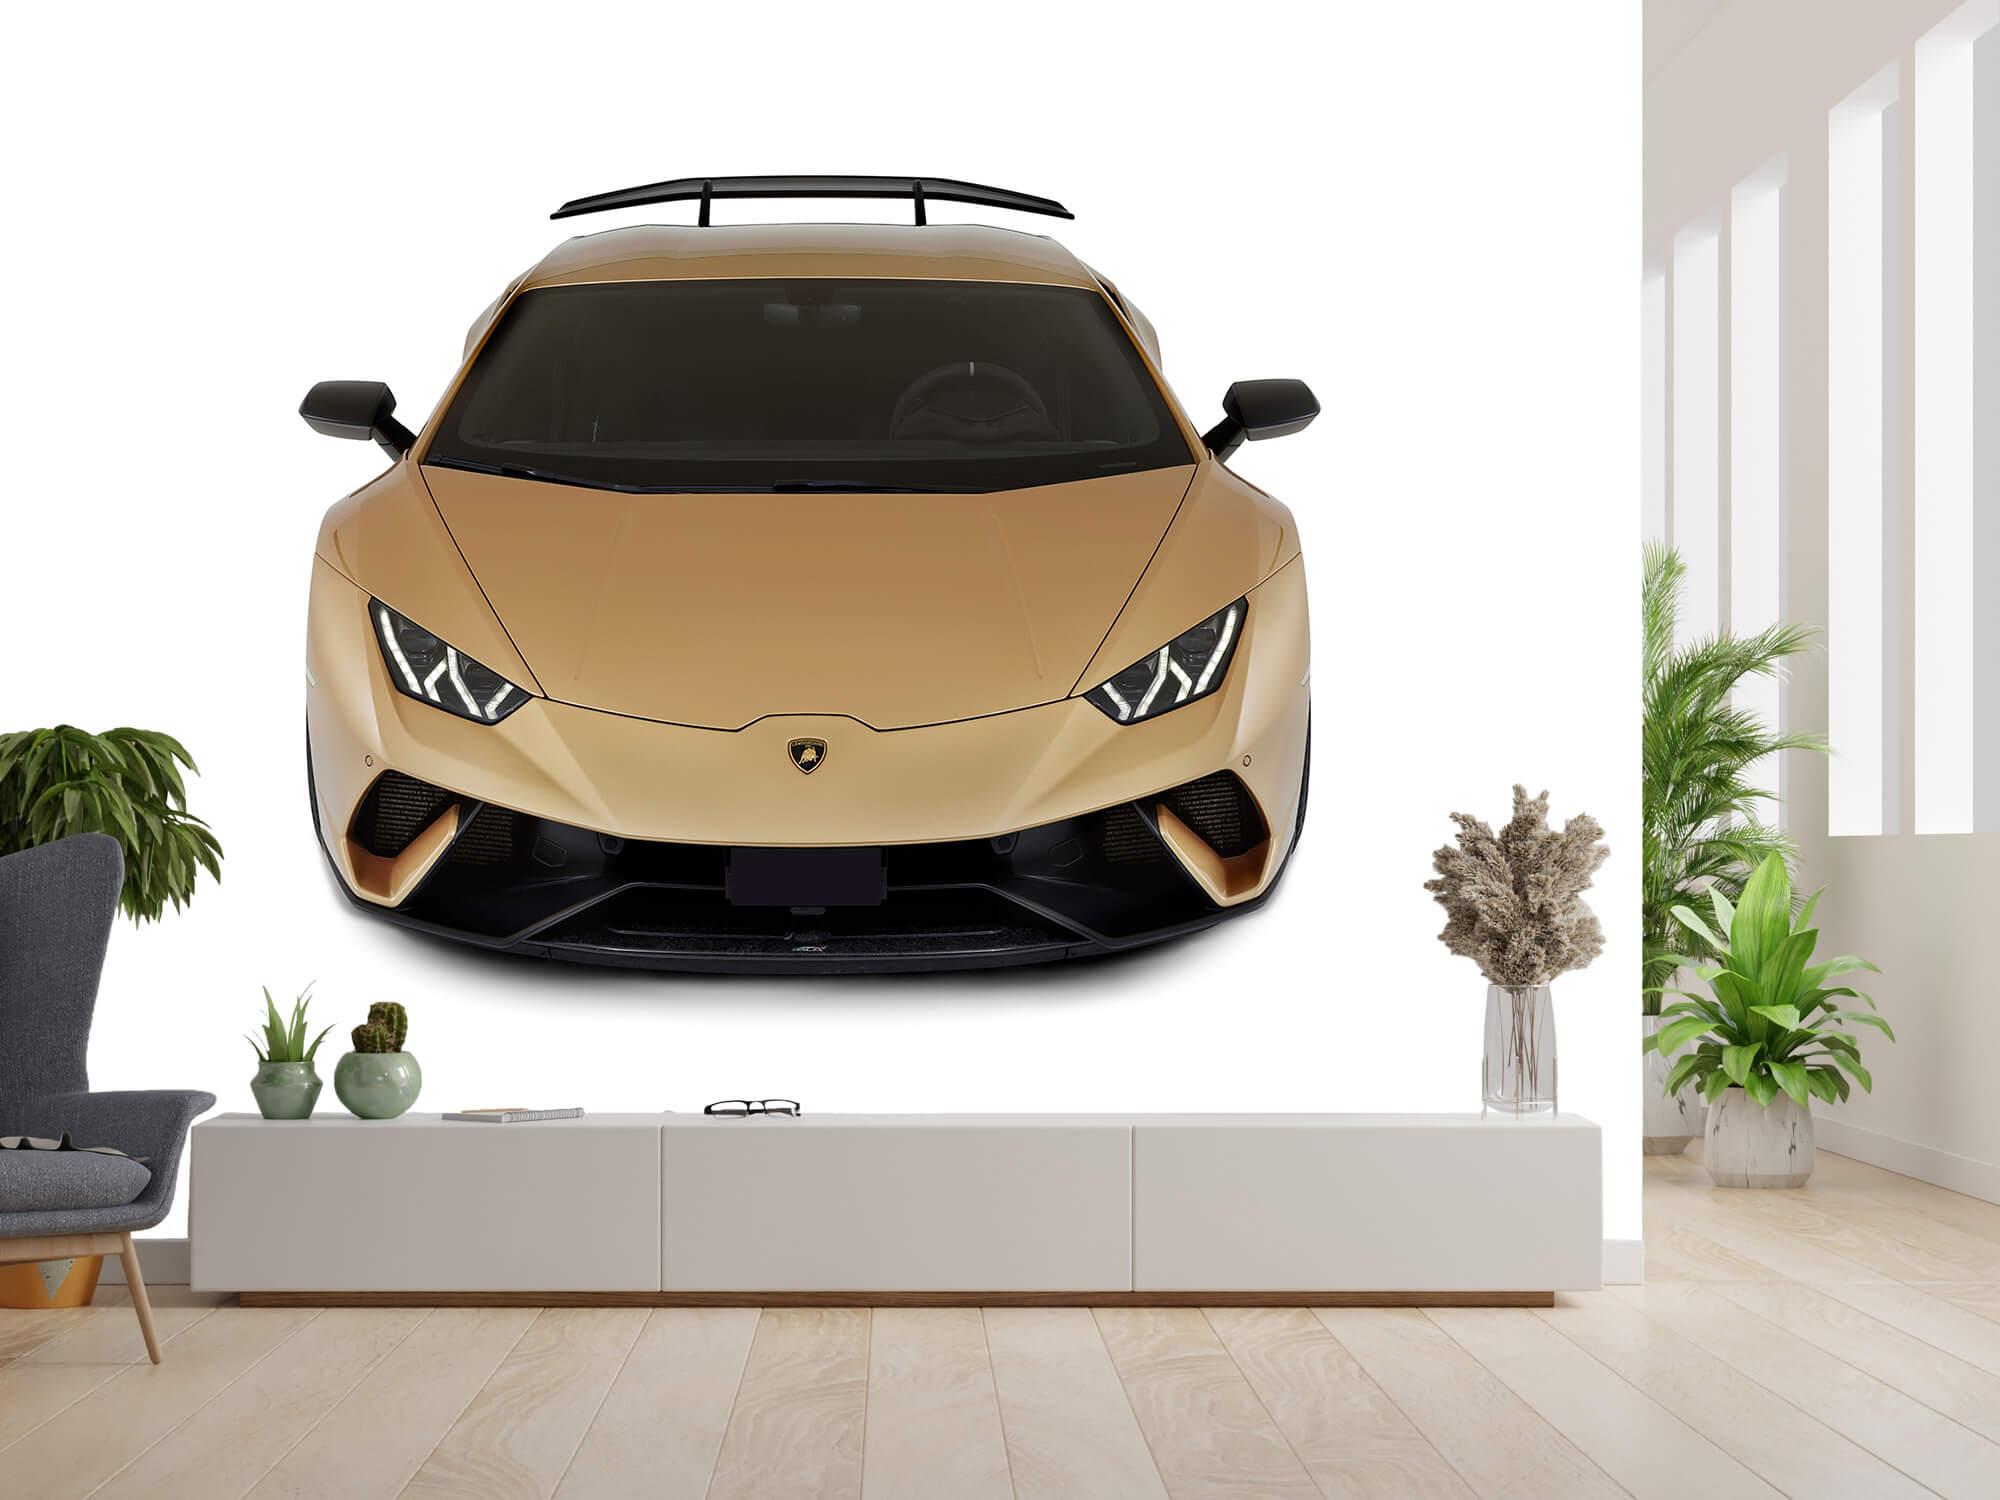 Wallpaper Lamborghini Huracán - Front from above, white 4